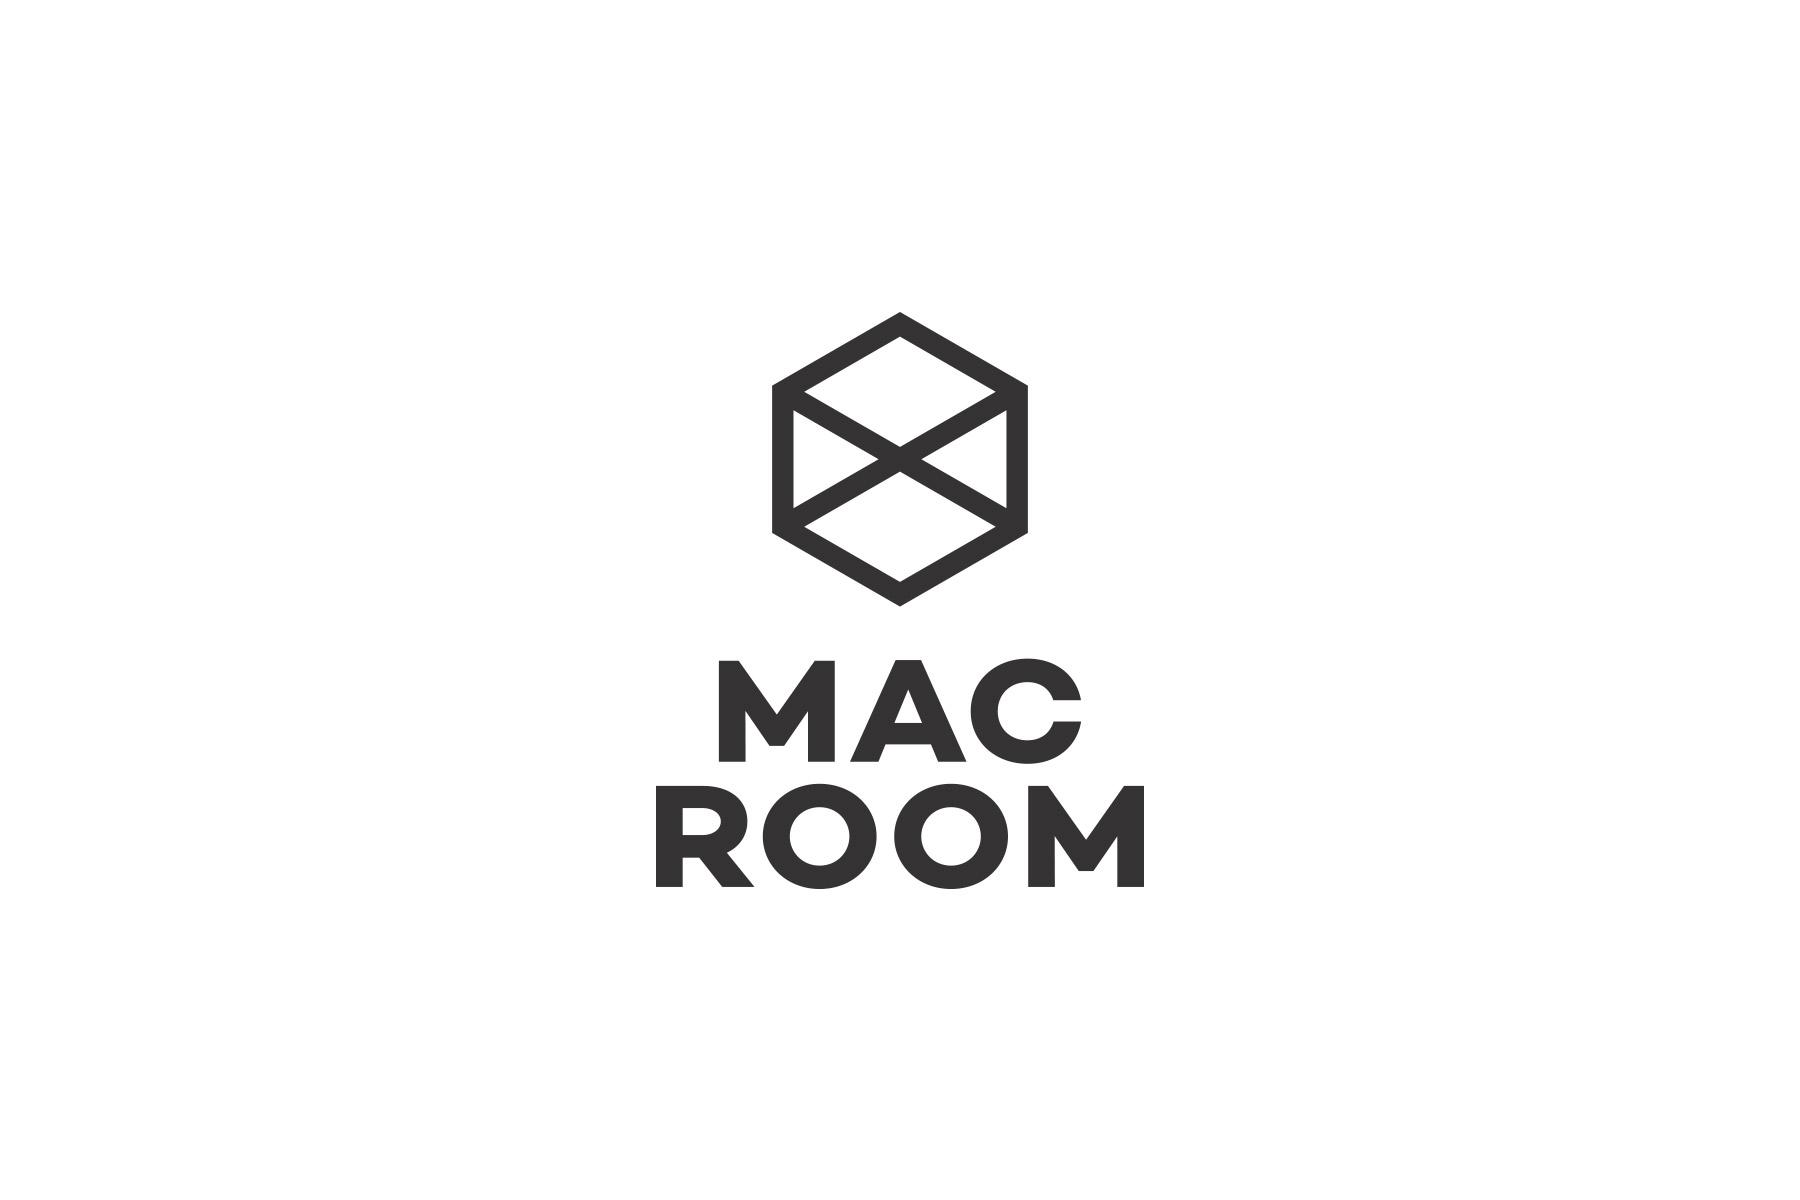 macroom.cz, MAC ROOM, BRNO, Grolich, design, Tobiáš Grolich